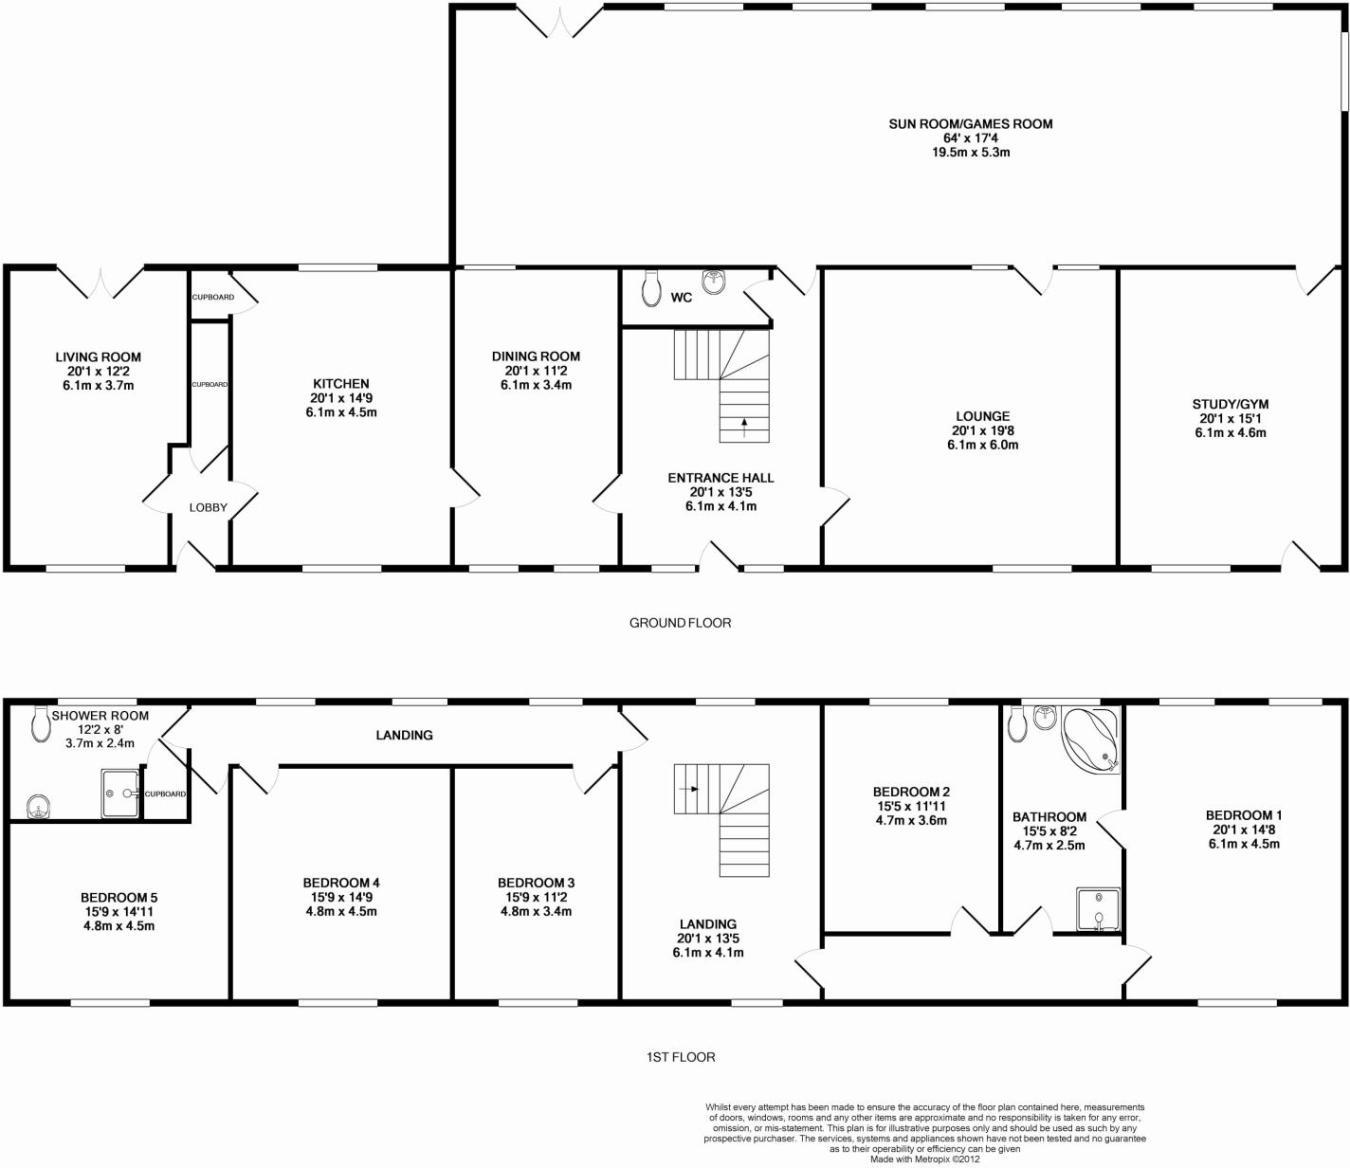 photo piggery floor plan design images 100 piggery